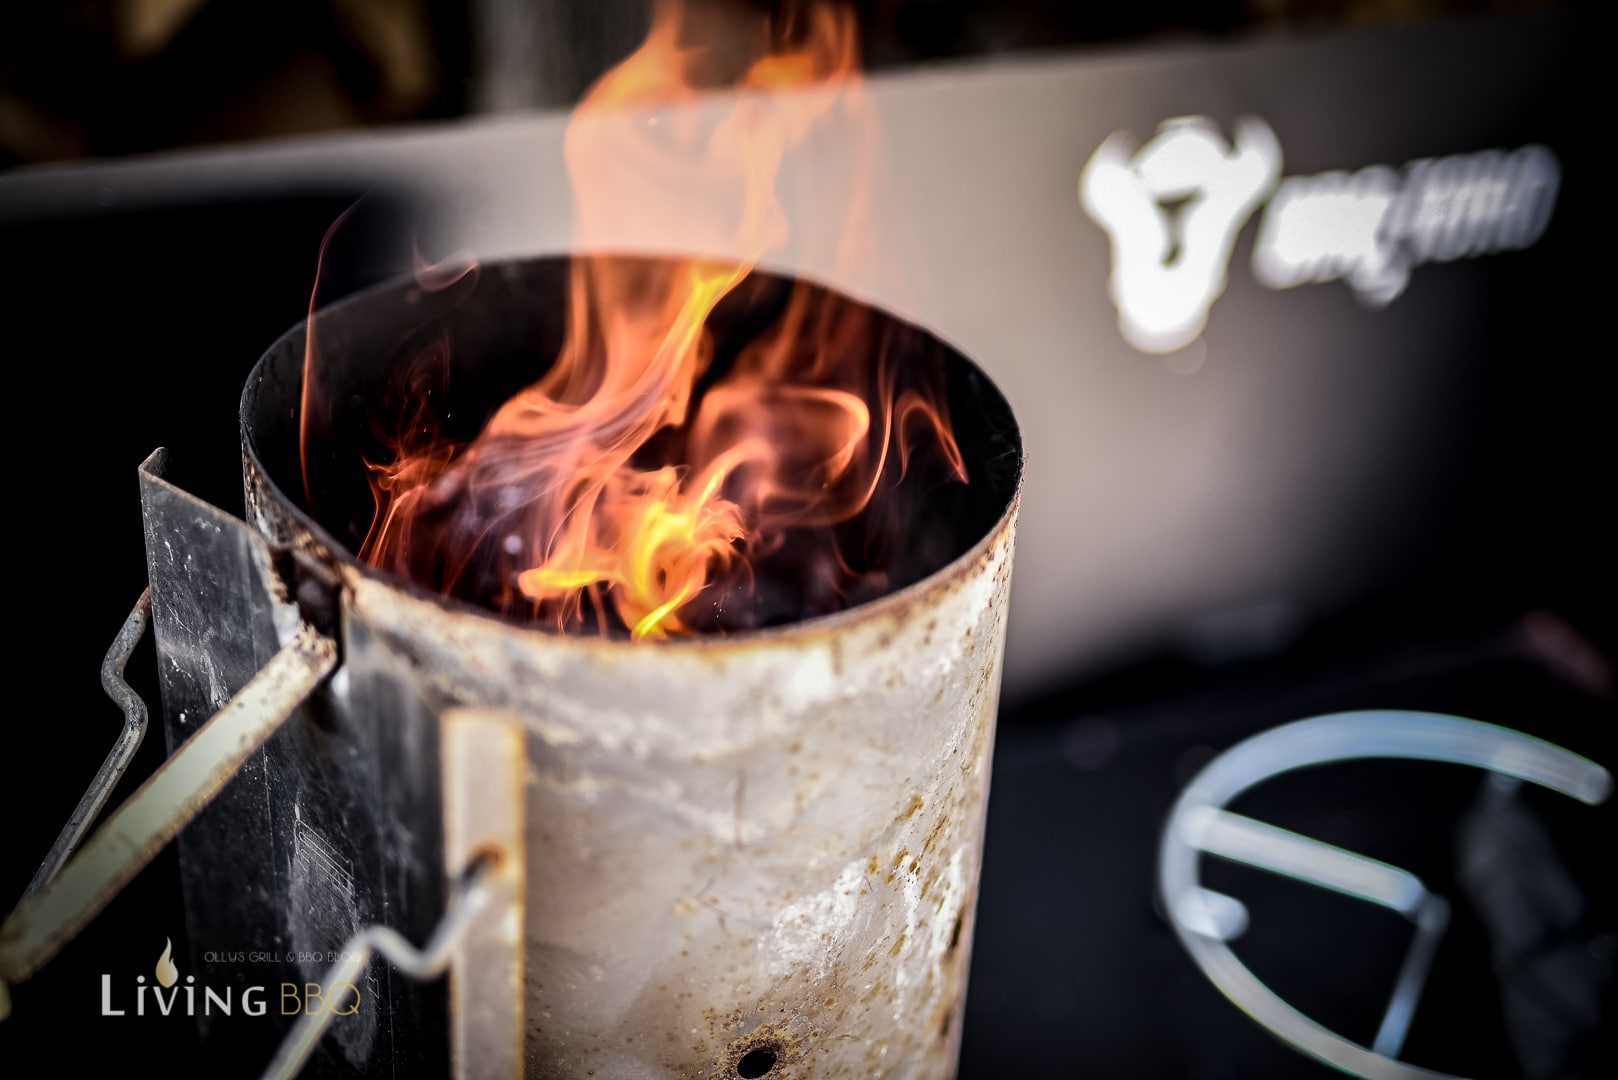 Anzündkamin mit Kohlen anfeuern